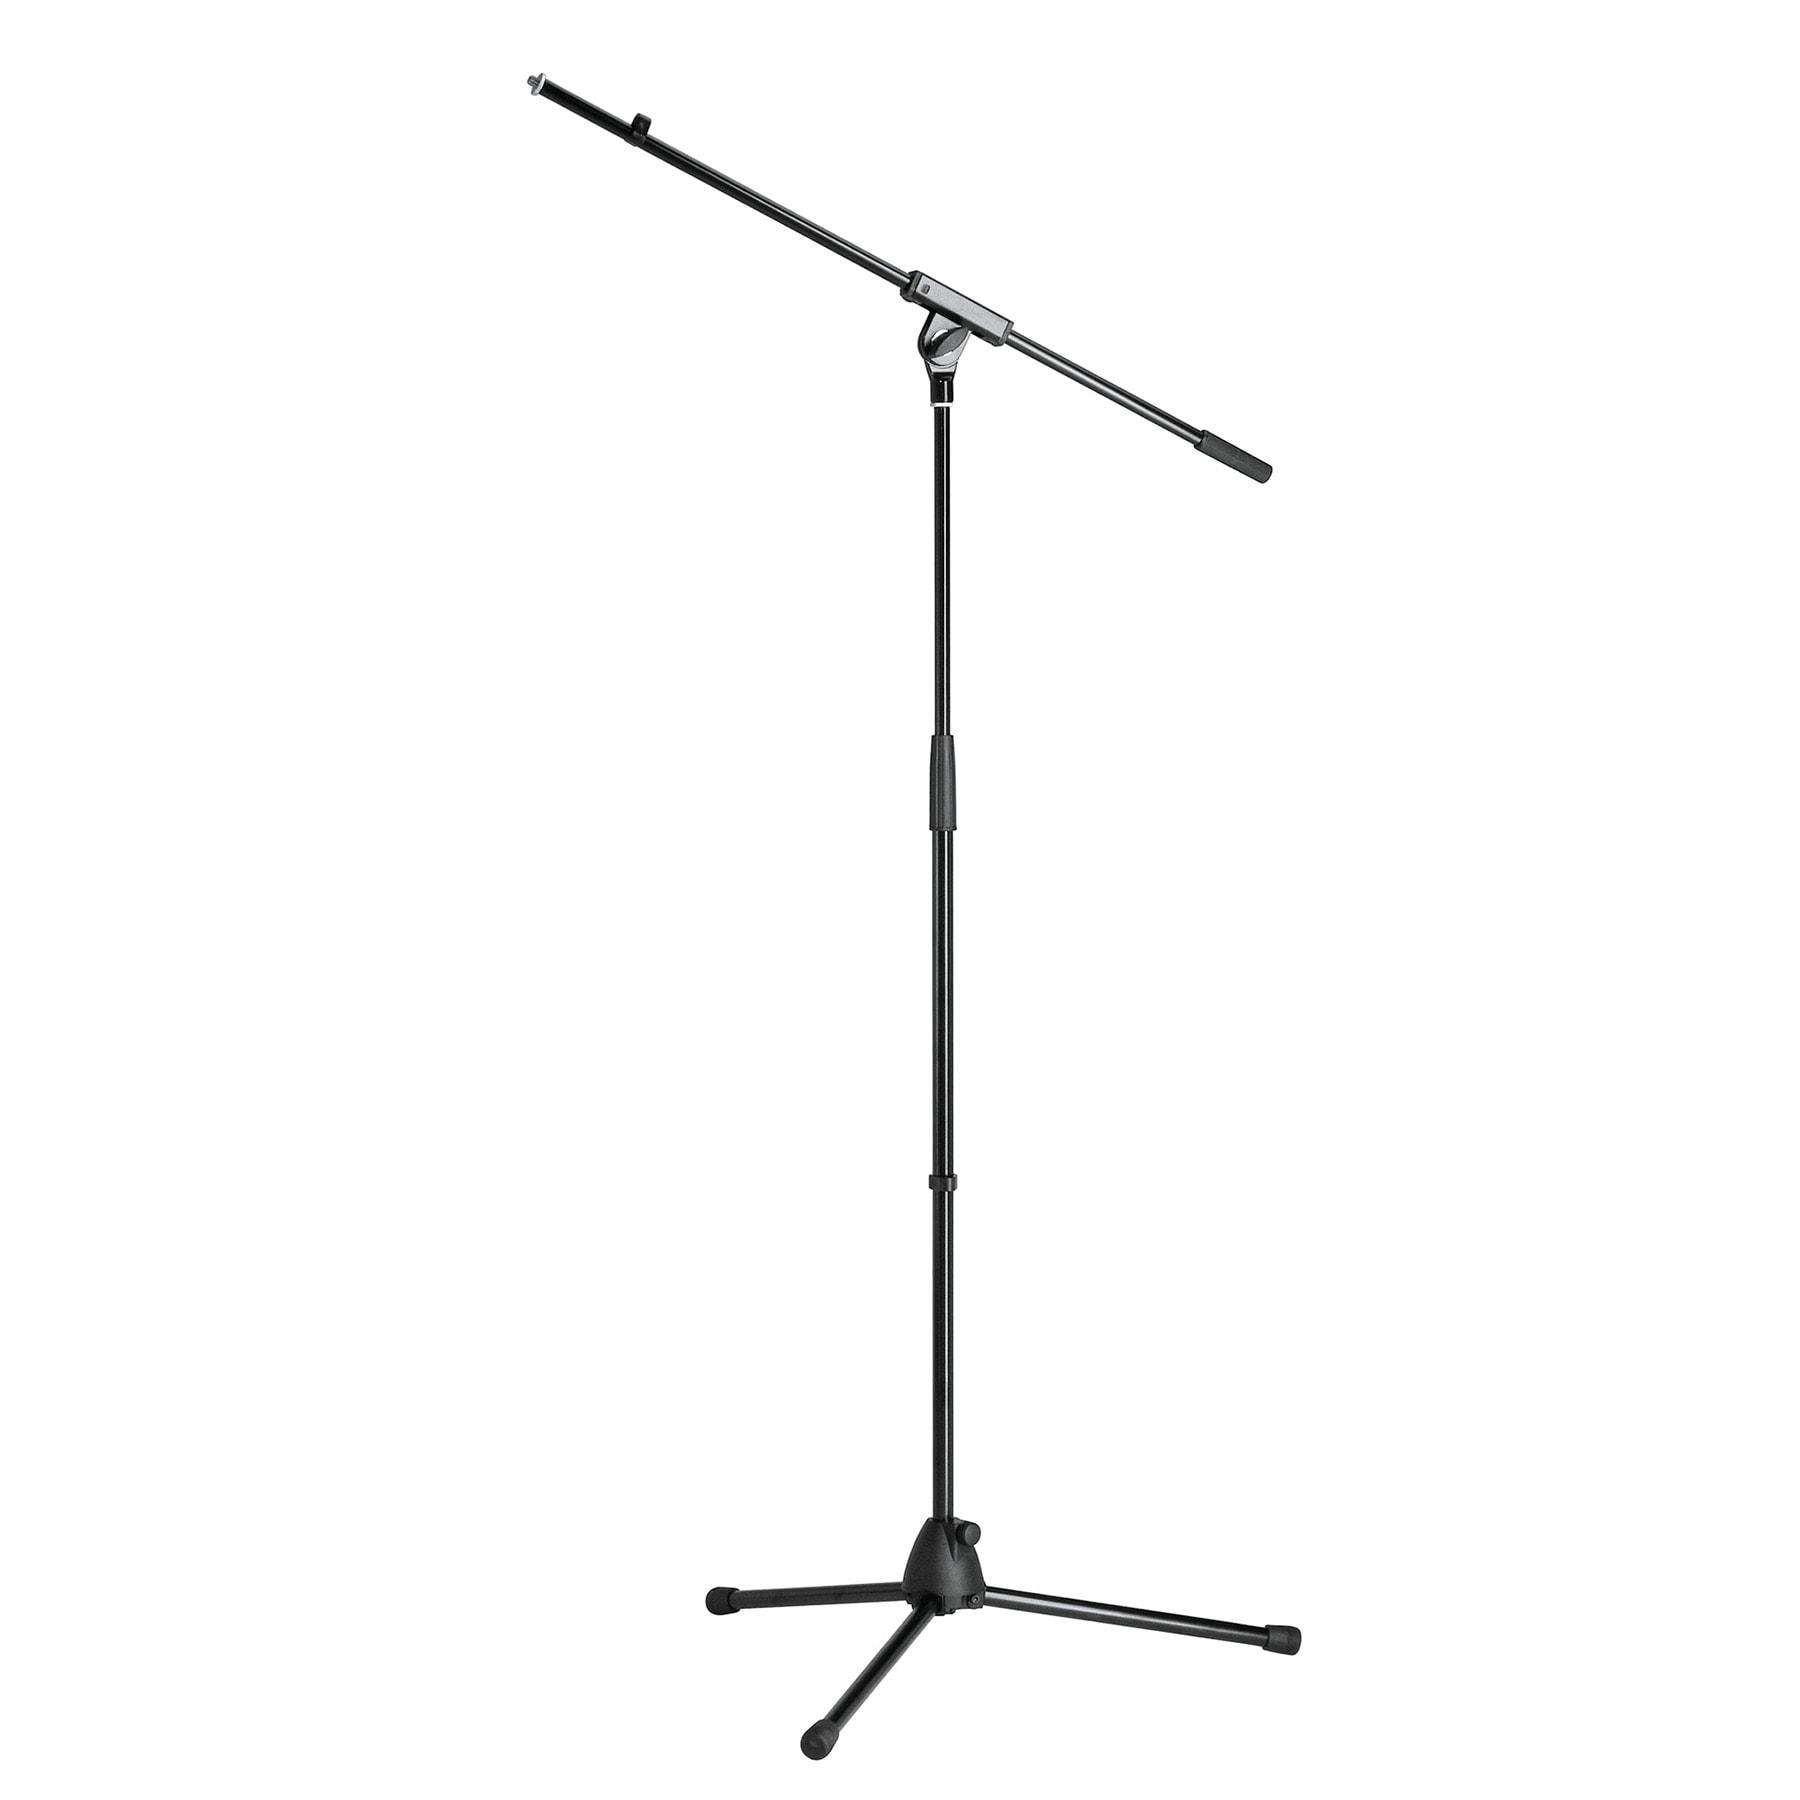 KM27105 - Microphone stand